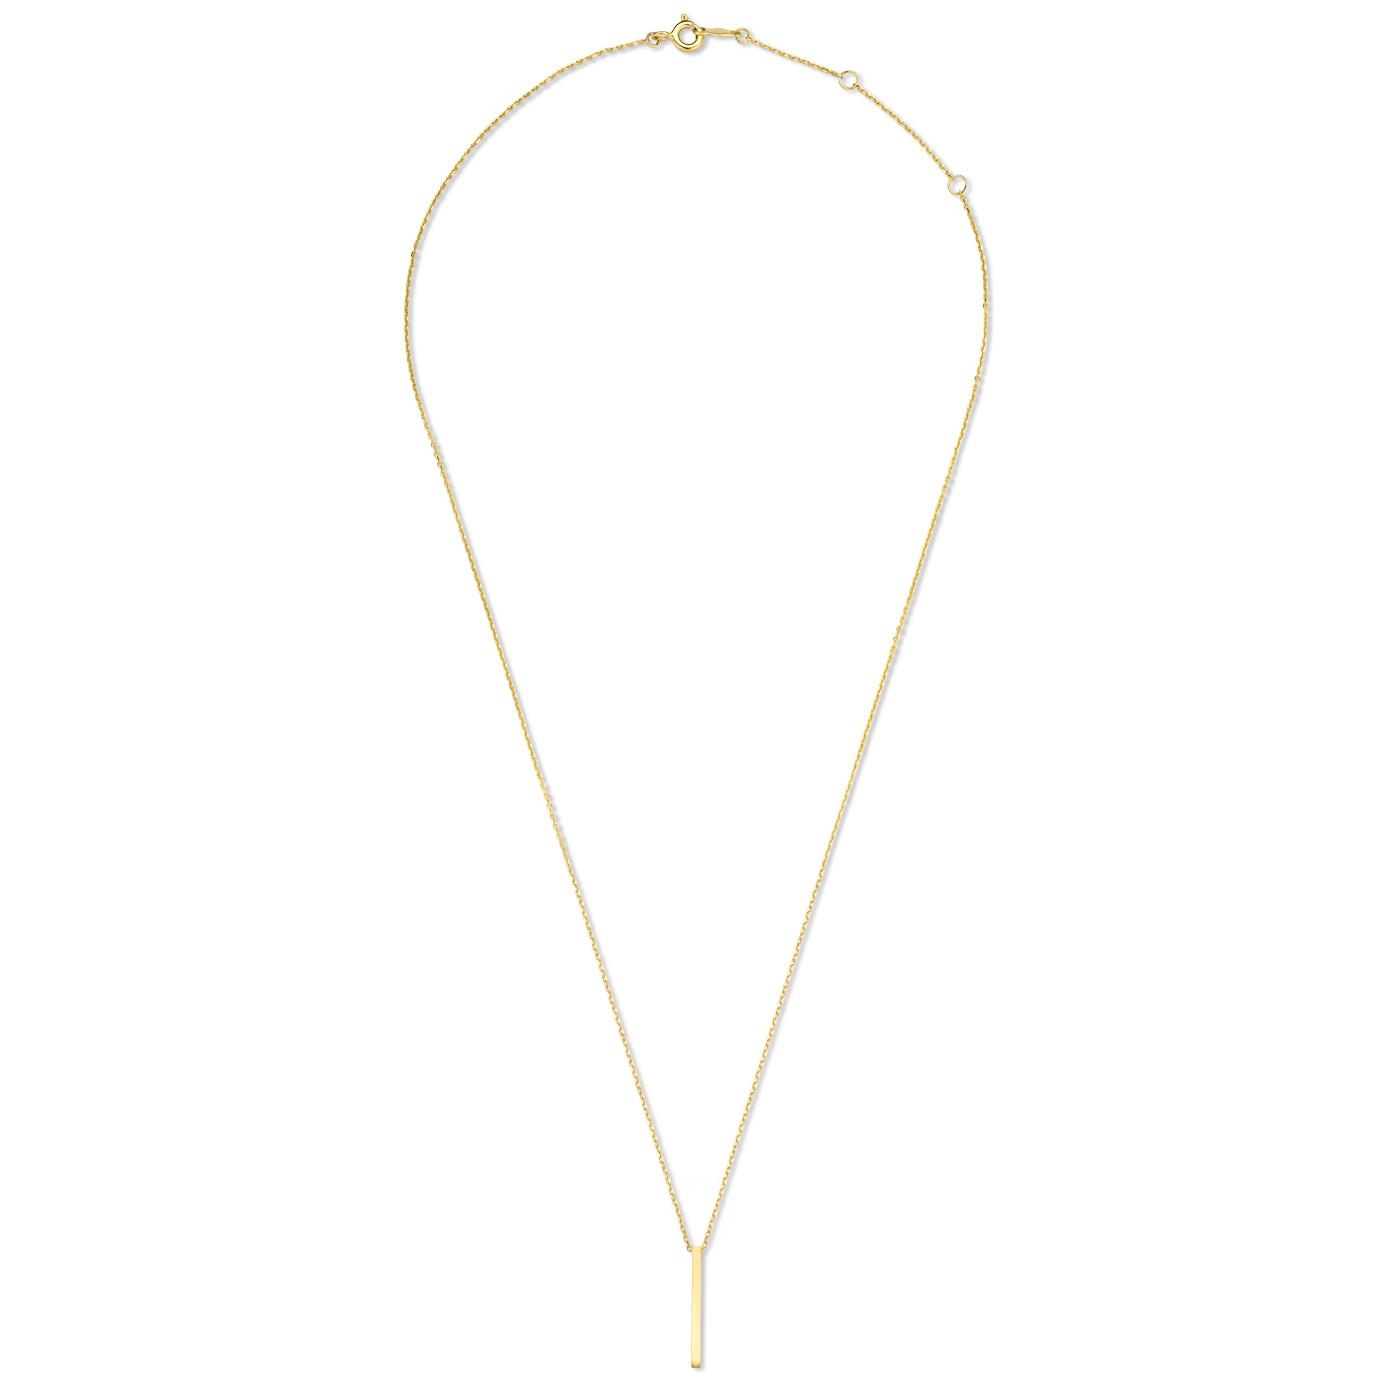 Isabel Bernard Le Marais Eloise 585er Goldkette mit Stangen